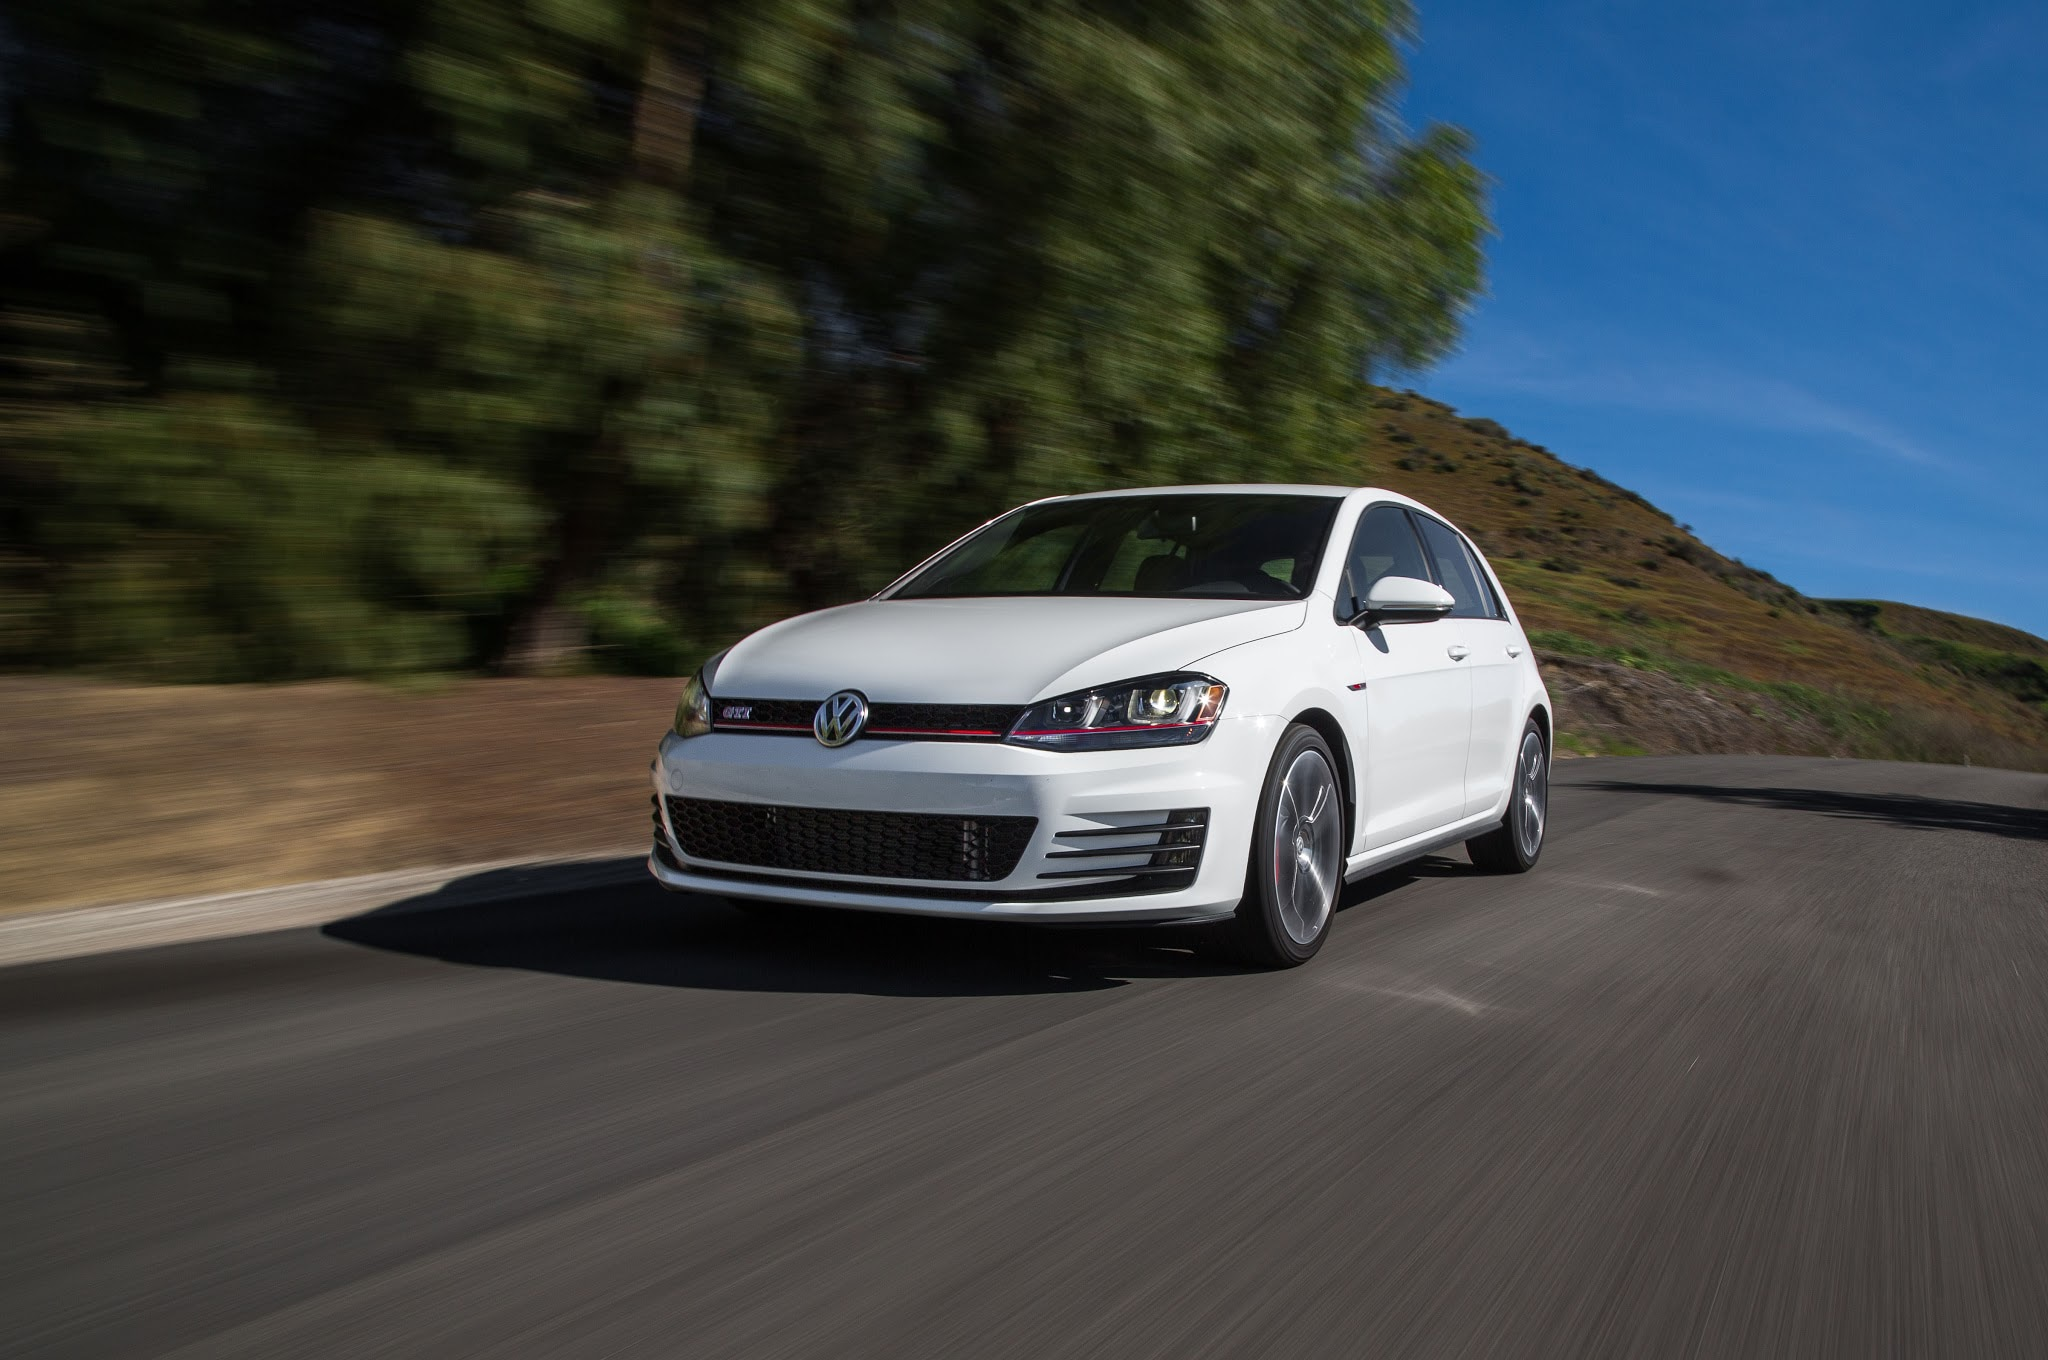 2015 Volkswagen Golf GTI Manual or DSG